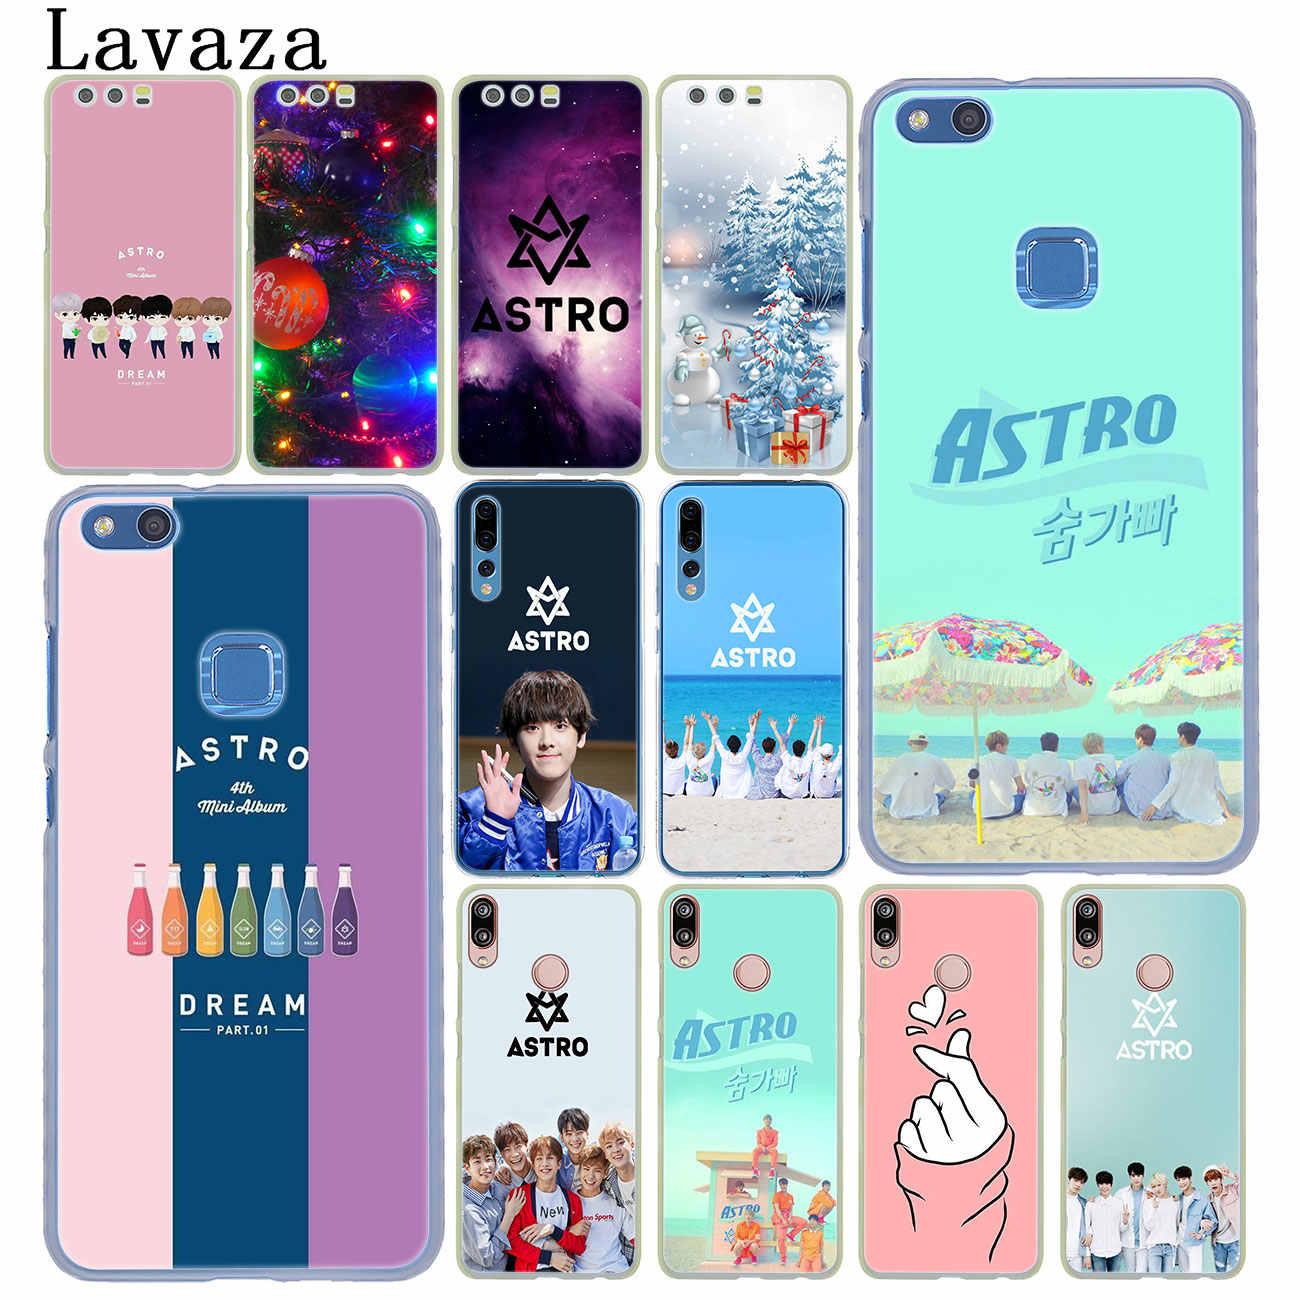 Lavaza KPOP ASTRO hartvormige Telefoon Case voor Huawei Y9 Y7 Y6 Prime 2019 2018 Honor 20 10 8C 8X8 9X9 Lite 7C 7X 7A Pro